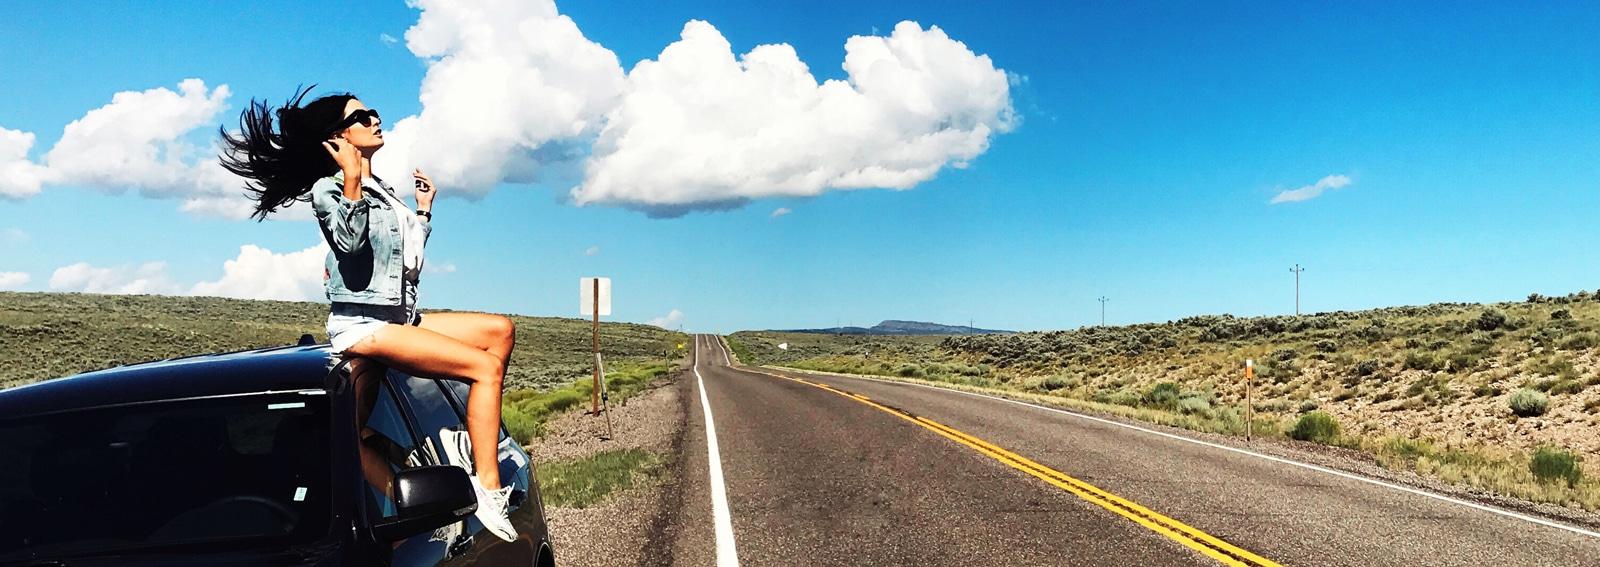 giulia valentina america road trip desktop